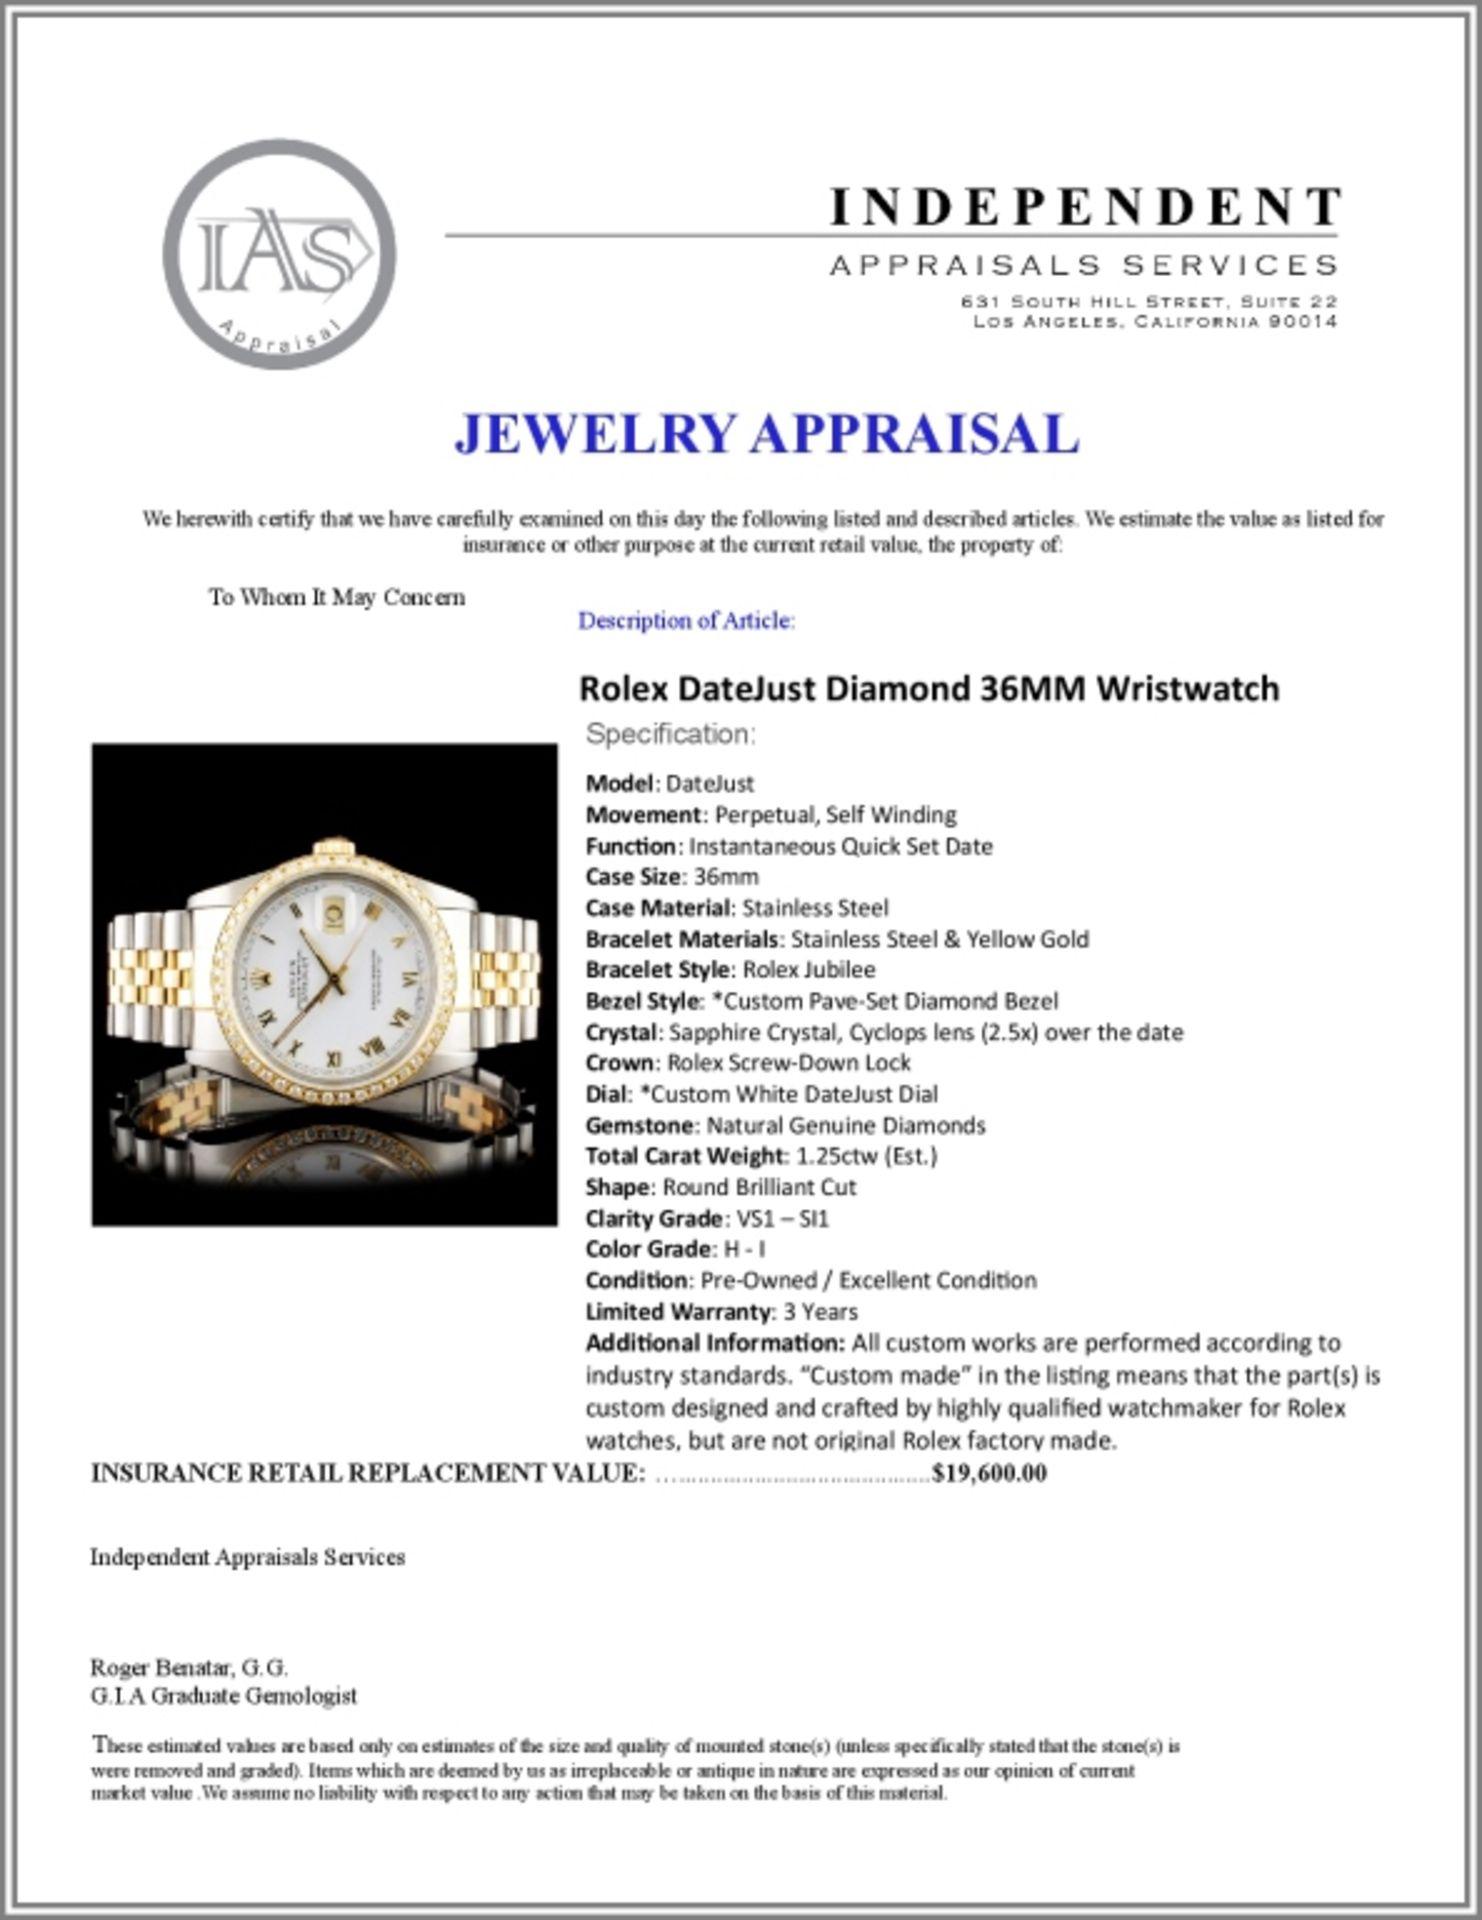 Rolex DateJust Diamond 36MM Wristwatch - Image 6 of 6